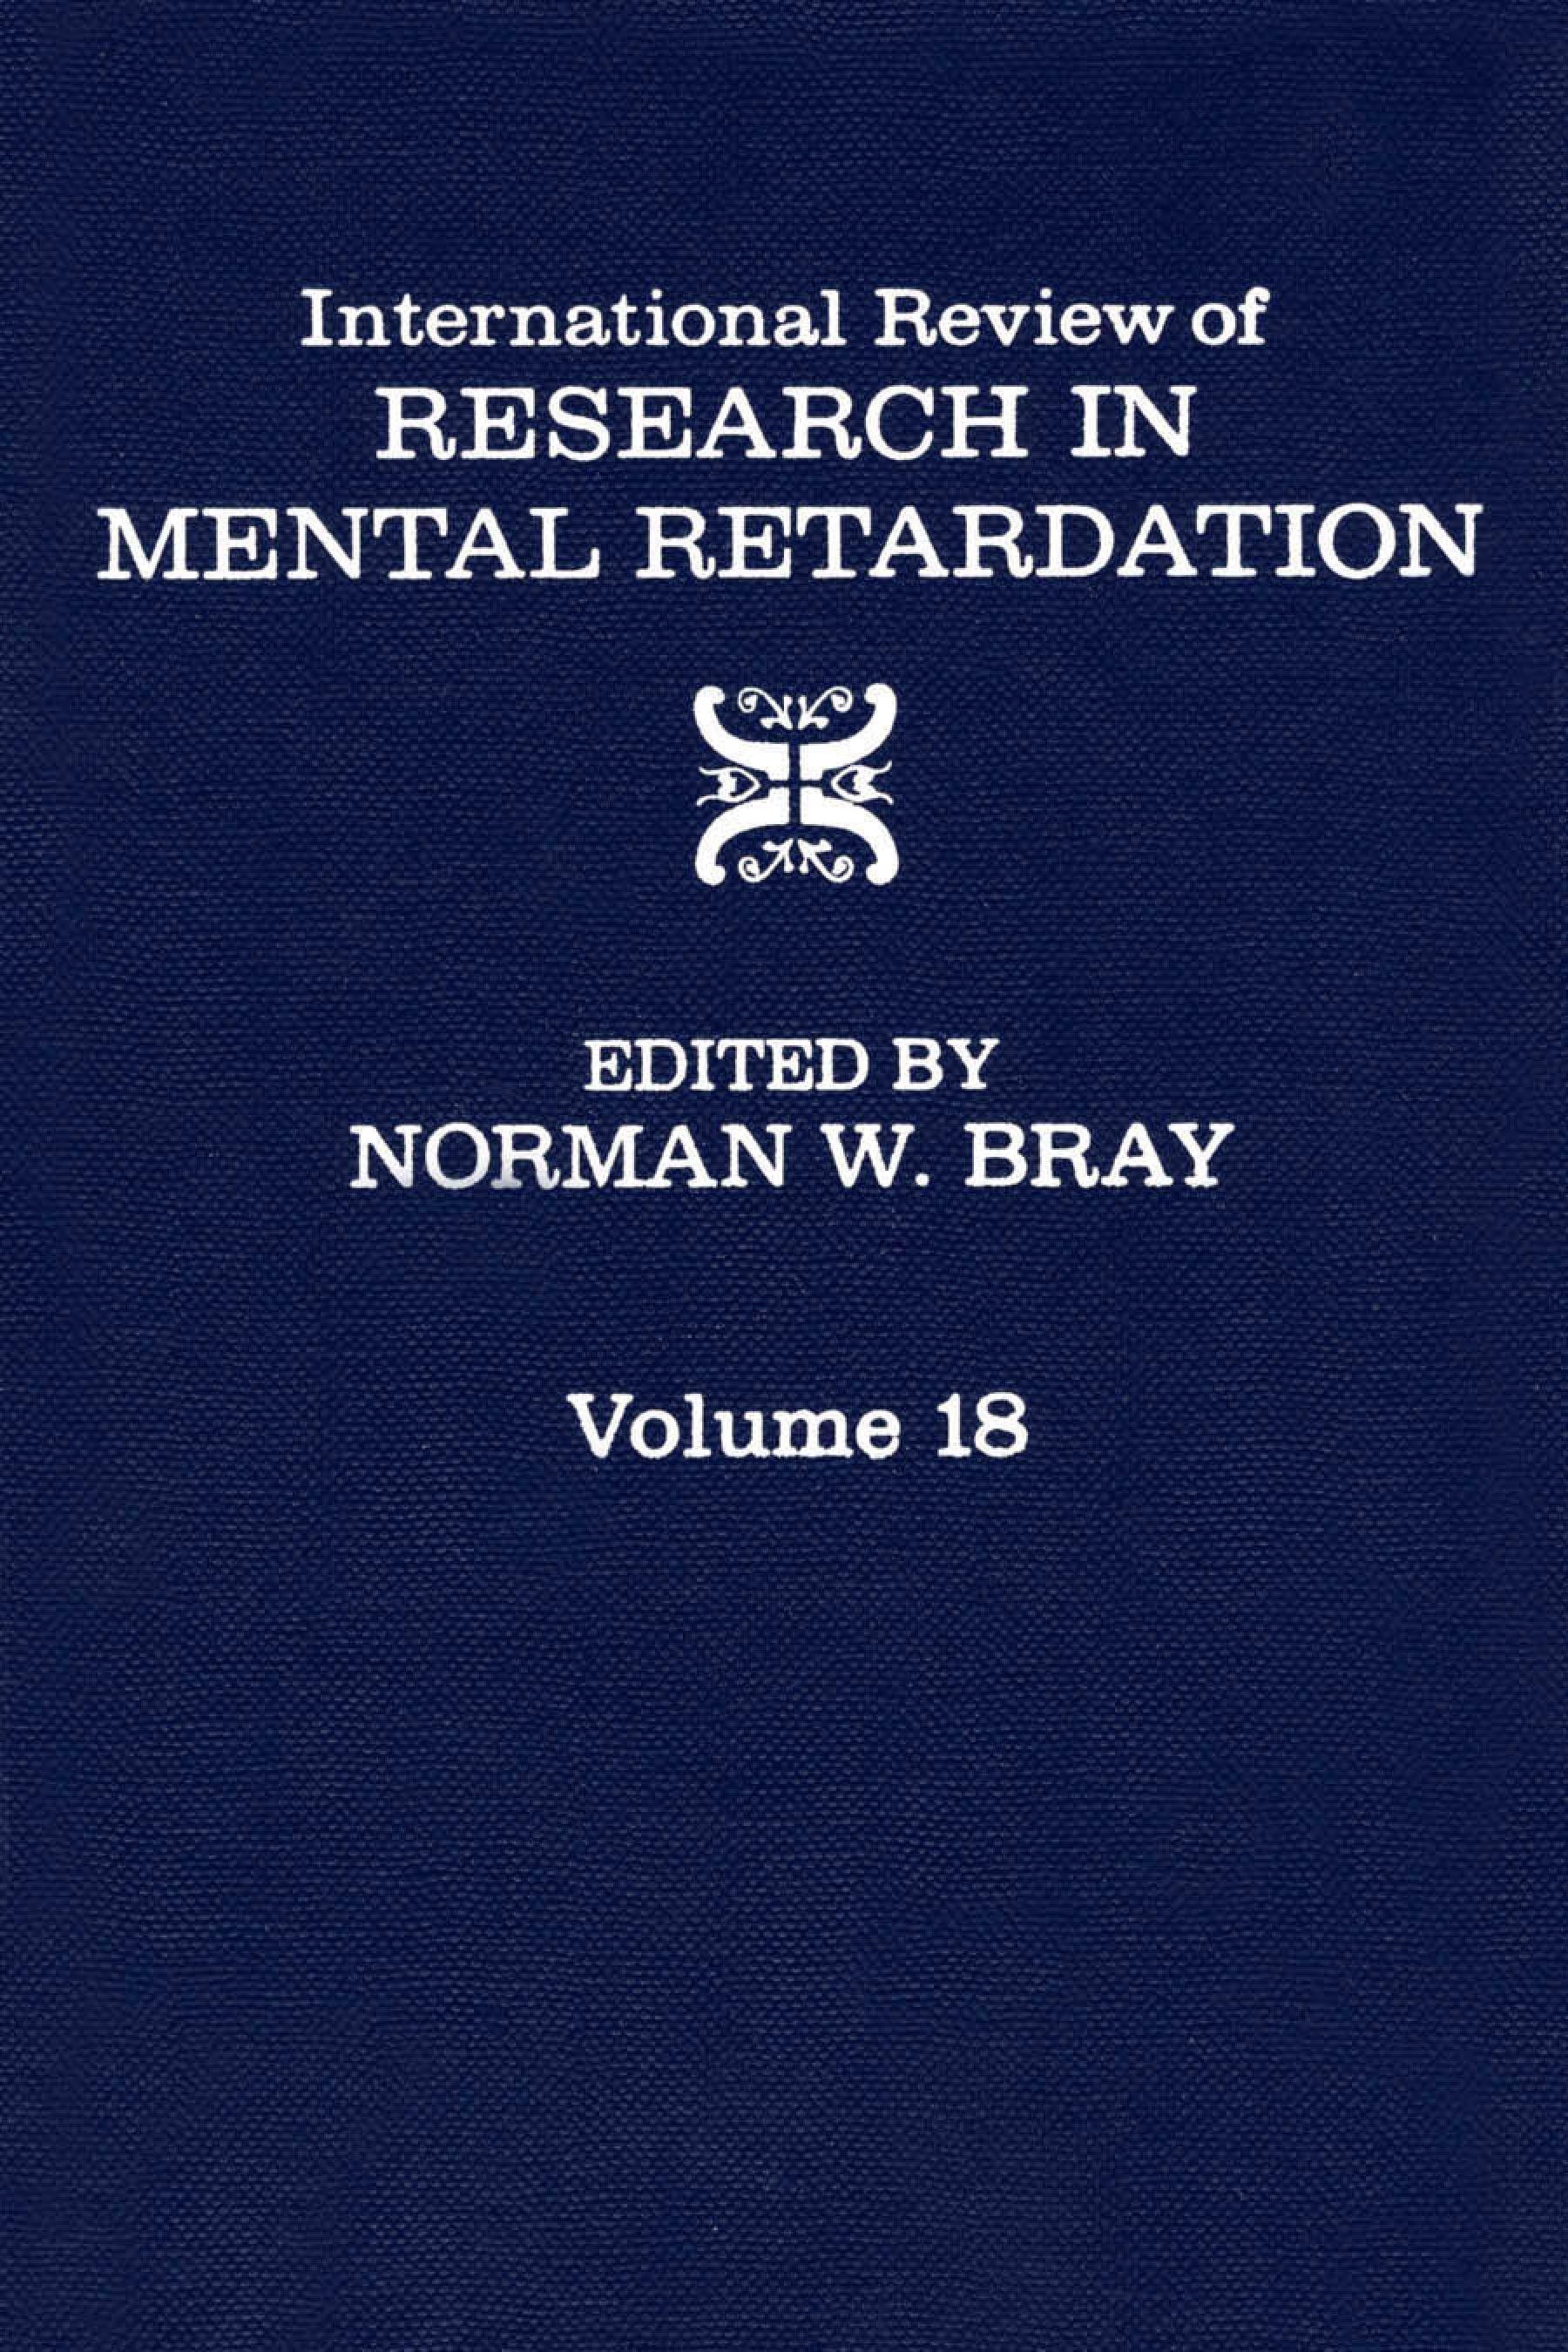 International Review of Research in Mental Retardation: Volume 18 EB9780080857961